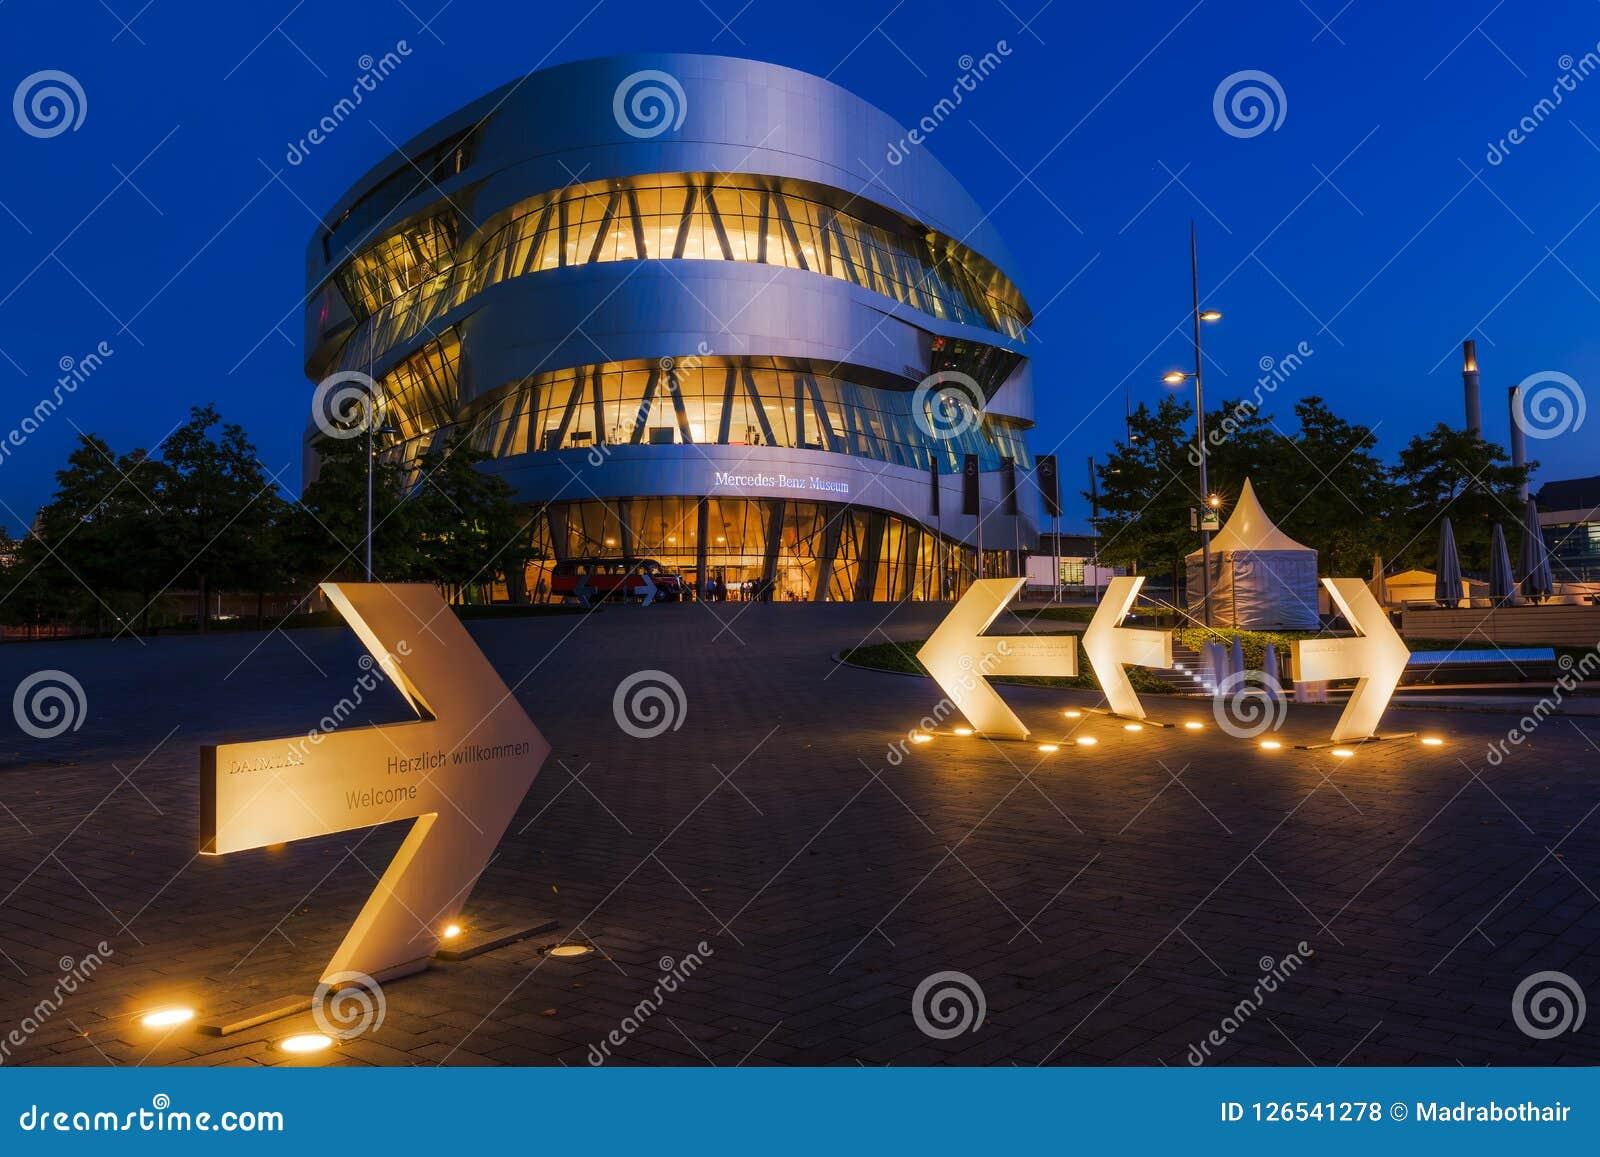 Mercedes Benz Museum in Stuttgart, Germany, at night